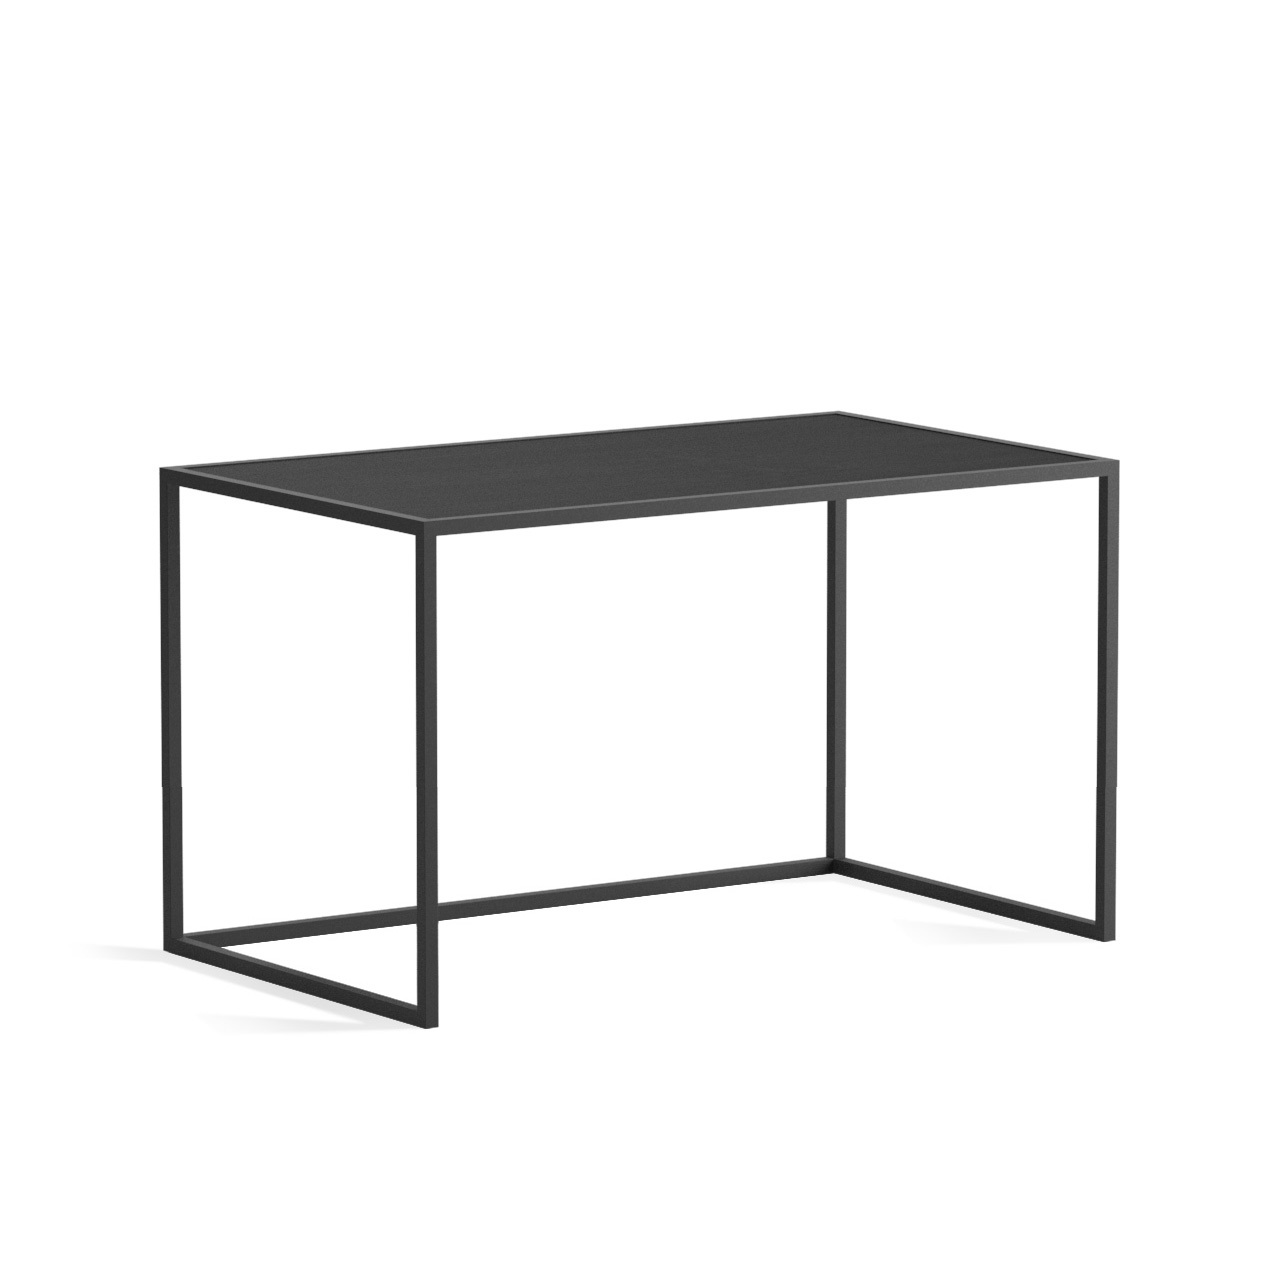 Письменный стол Romero lite black - вид 1